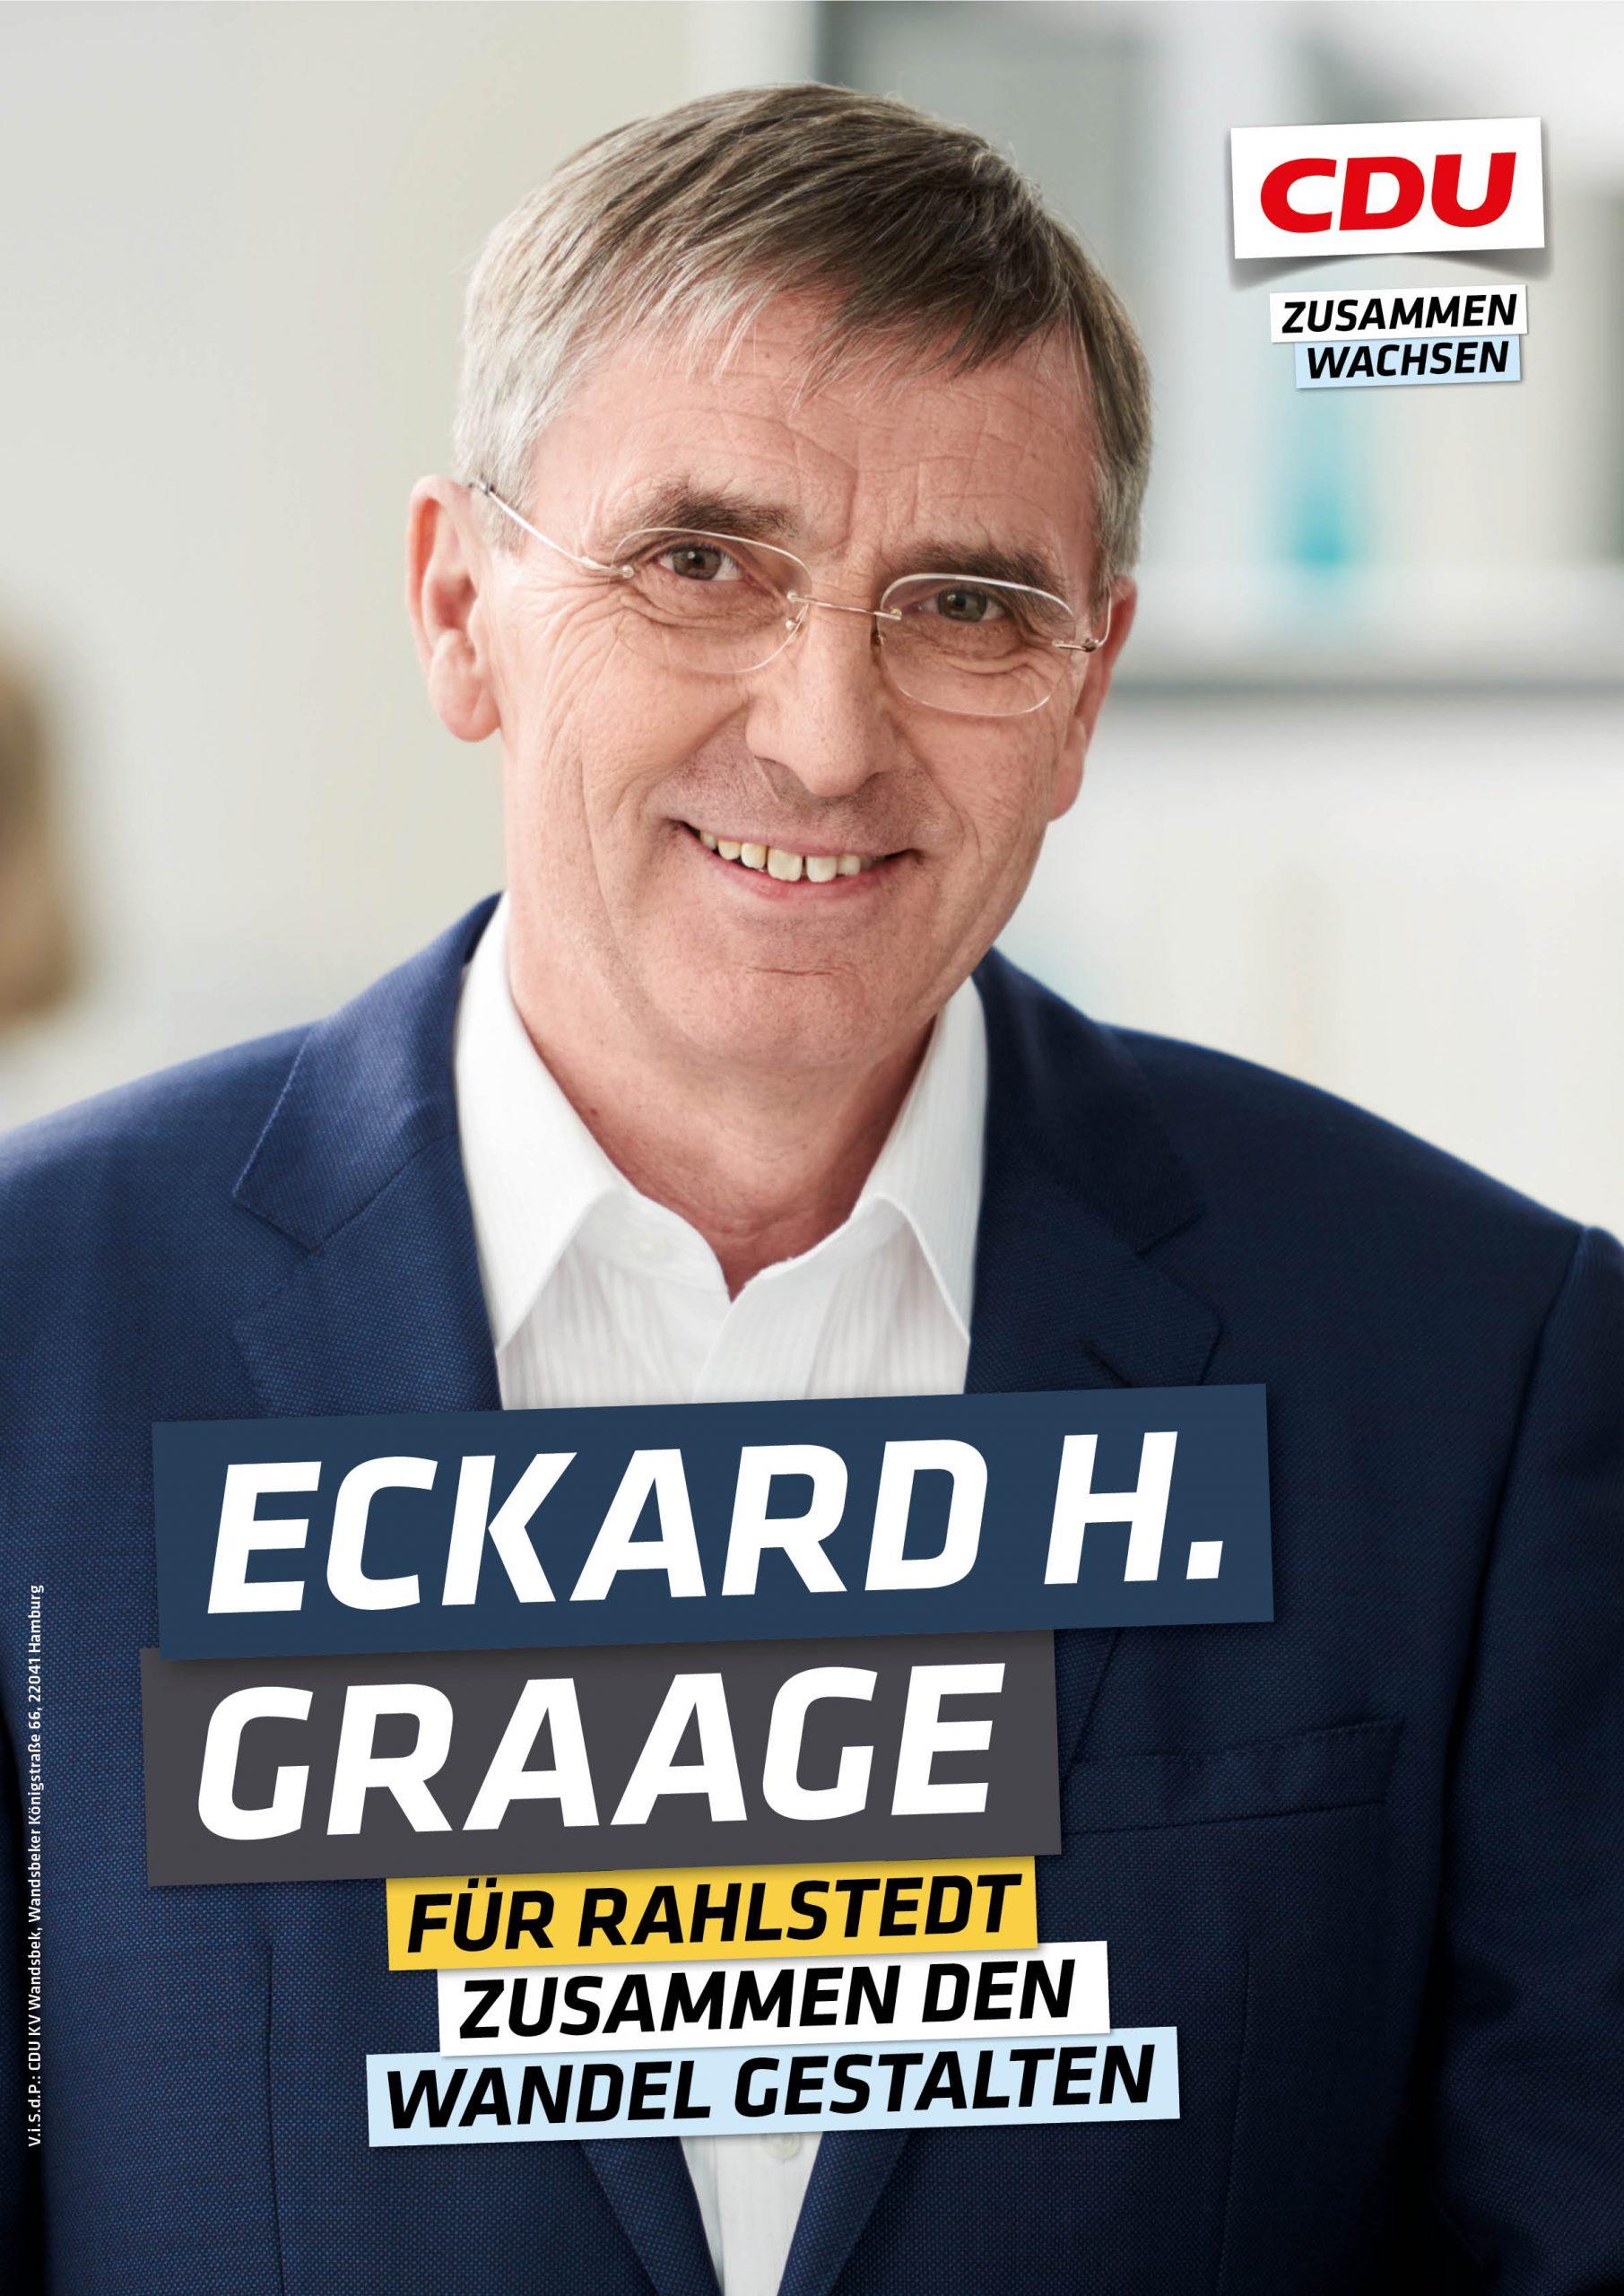 https://www.eckard-graage.de/wp-content/uploads/2019/12/CDU-HH_Kandidatenplakat-A0_Eckard_H_Graage_E2_druckzilla_-scaled.jpg